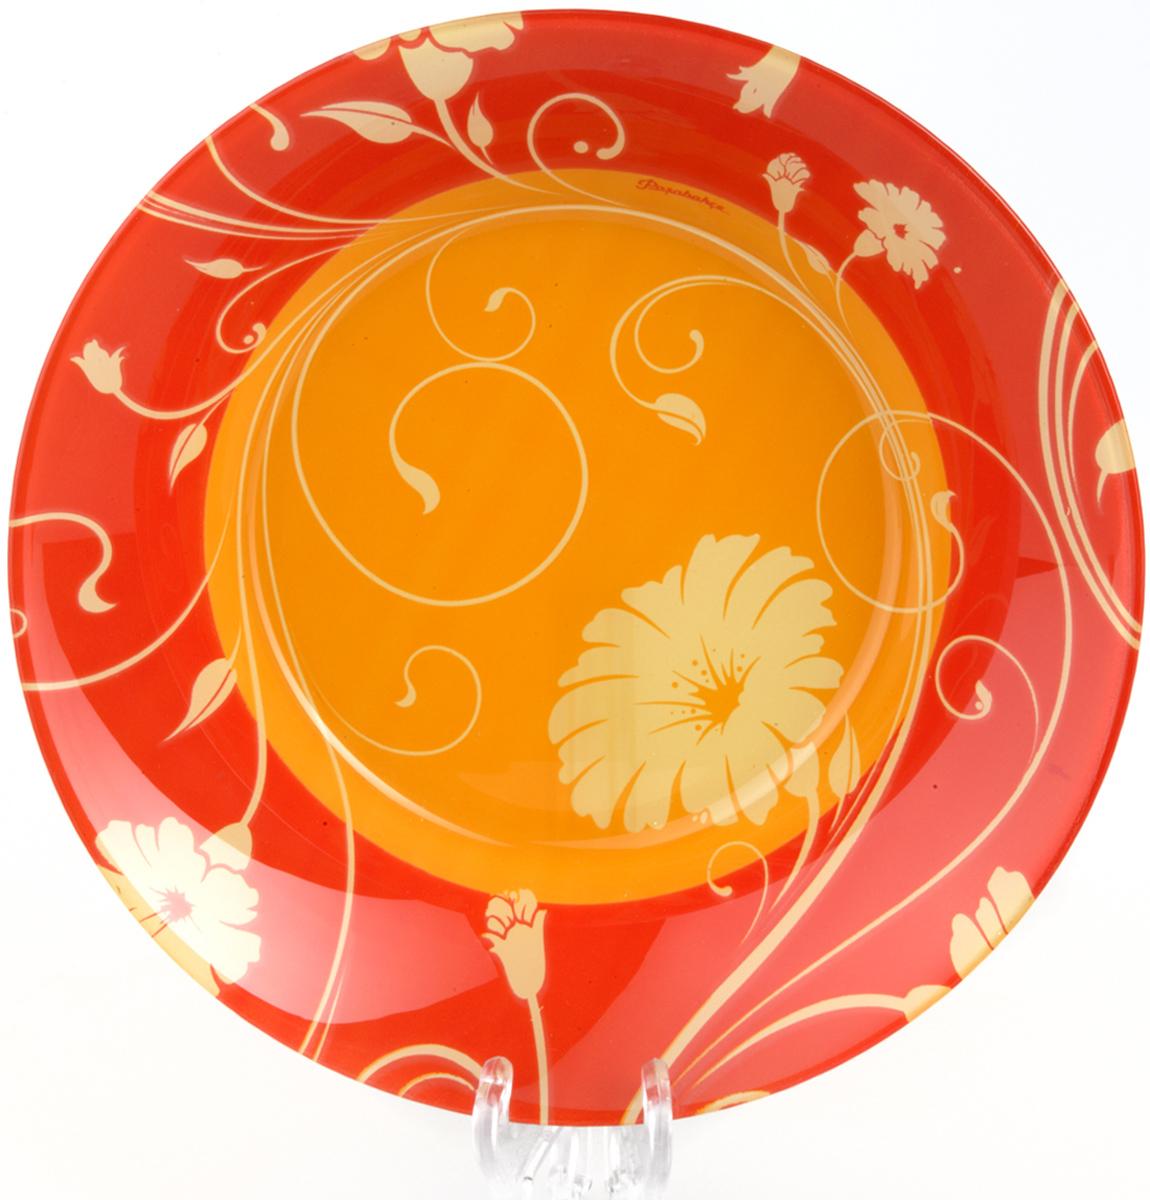 Тарелка Pasabahce Serenade, цвет: оранжевый, диаметр 22 см тарелка elff decor терра цвет оранжевый диаметр 21 см